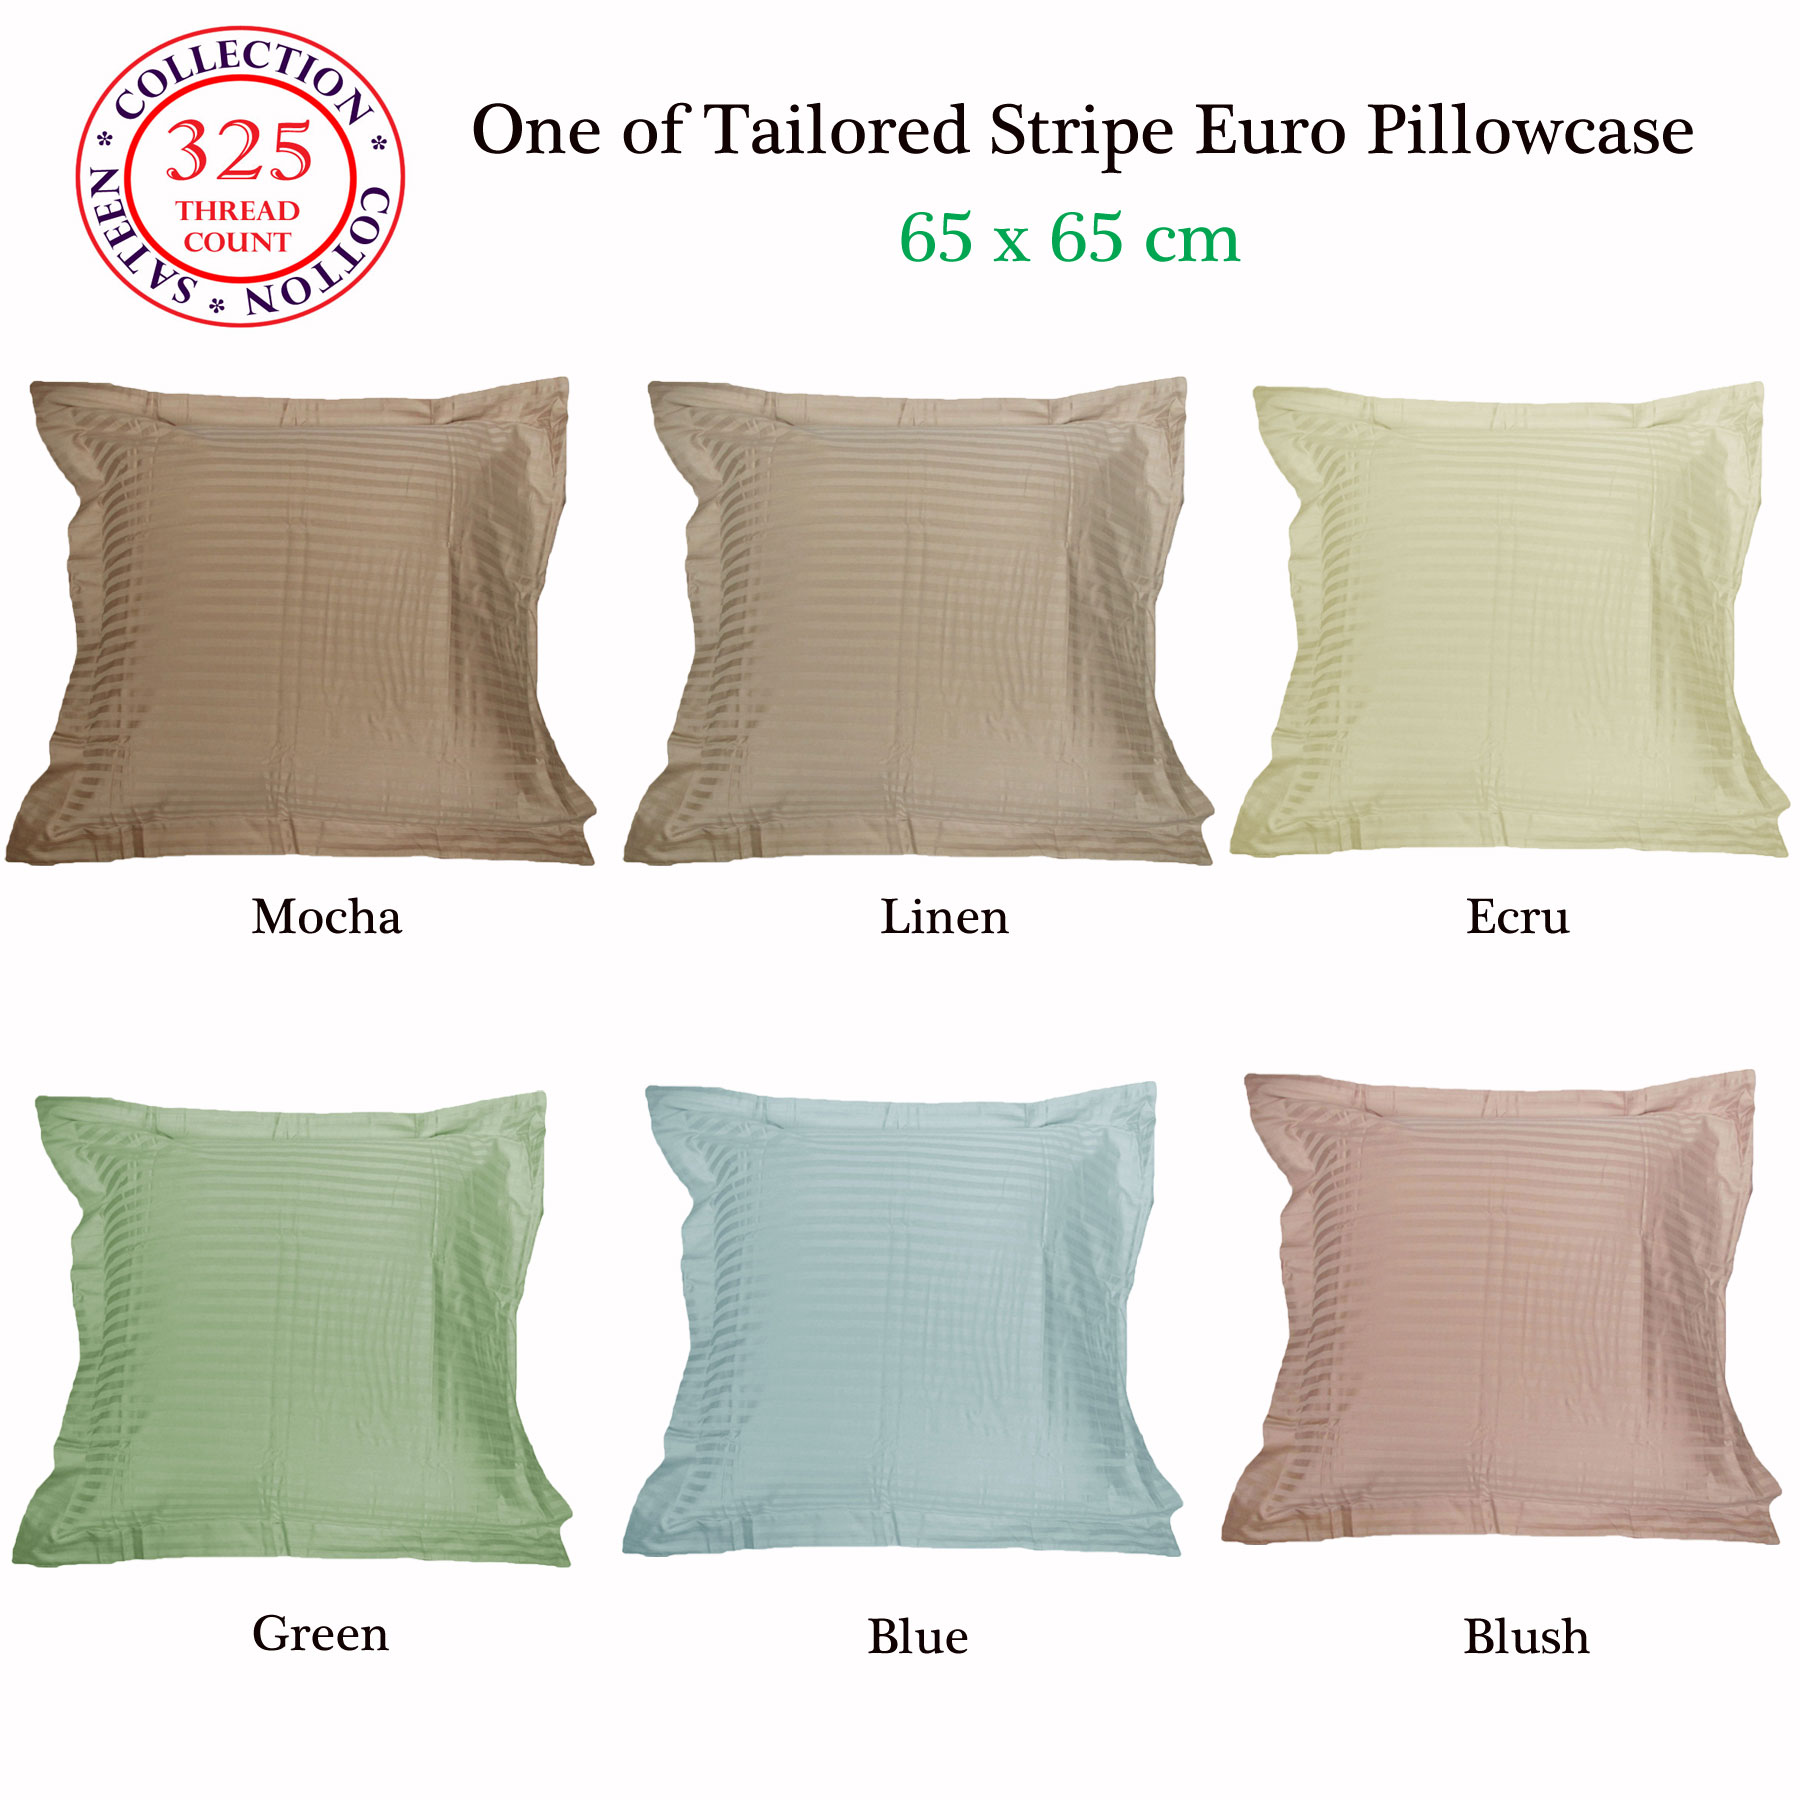 325TC 100% Pure Cotton Self Stripe European Pillowcase MOCHA LINEN ECRU GREEN